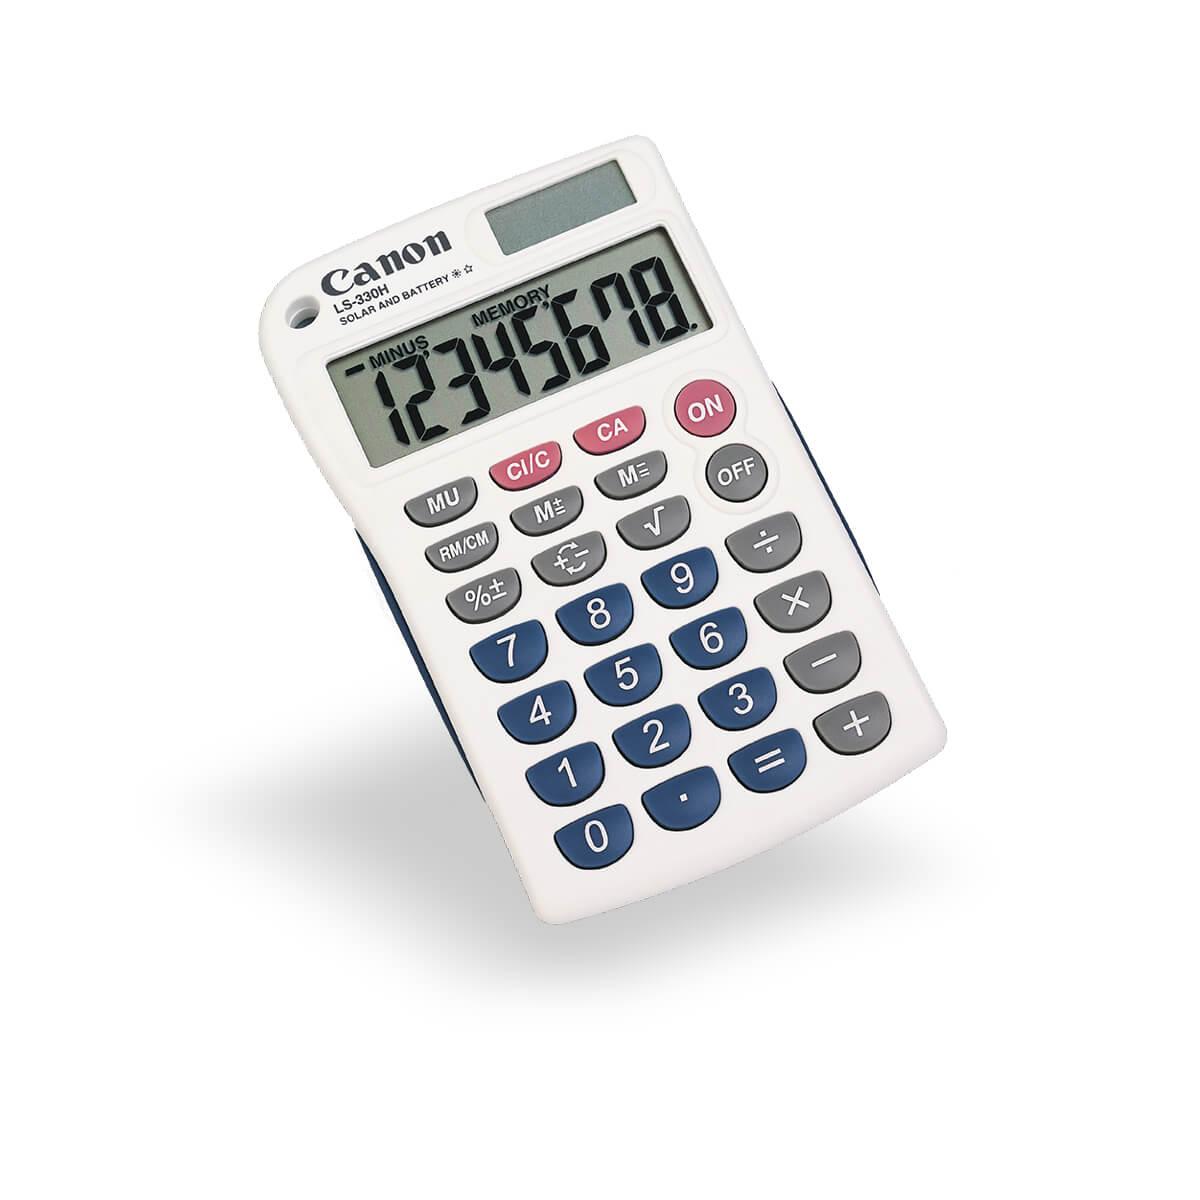 Canon LS-330H lightweight pocket calculator